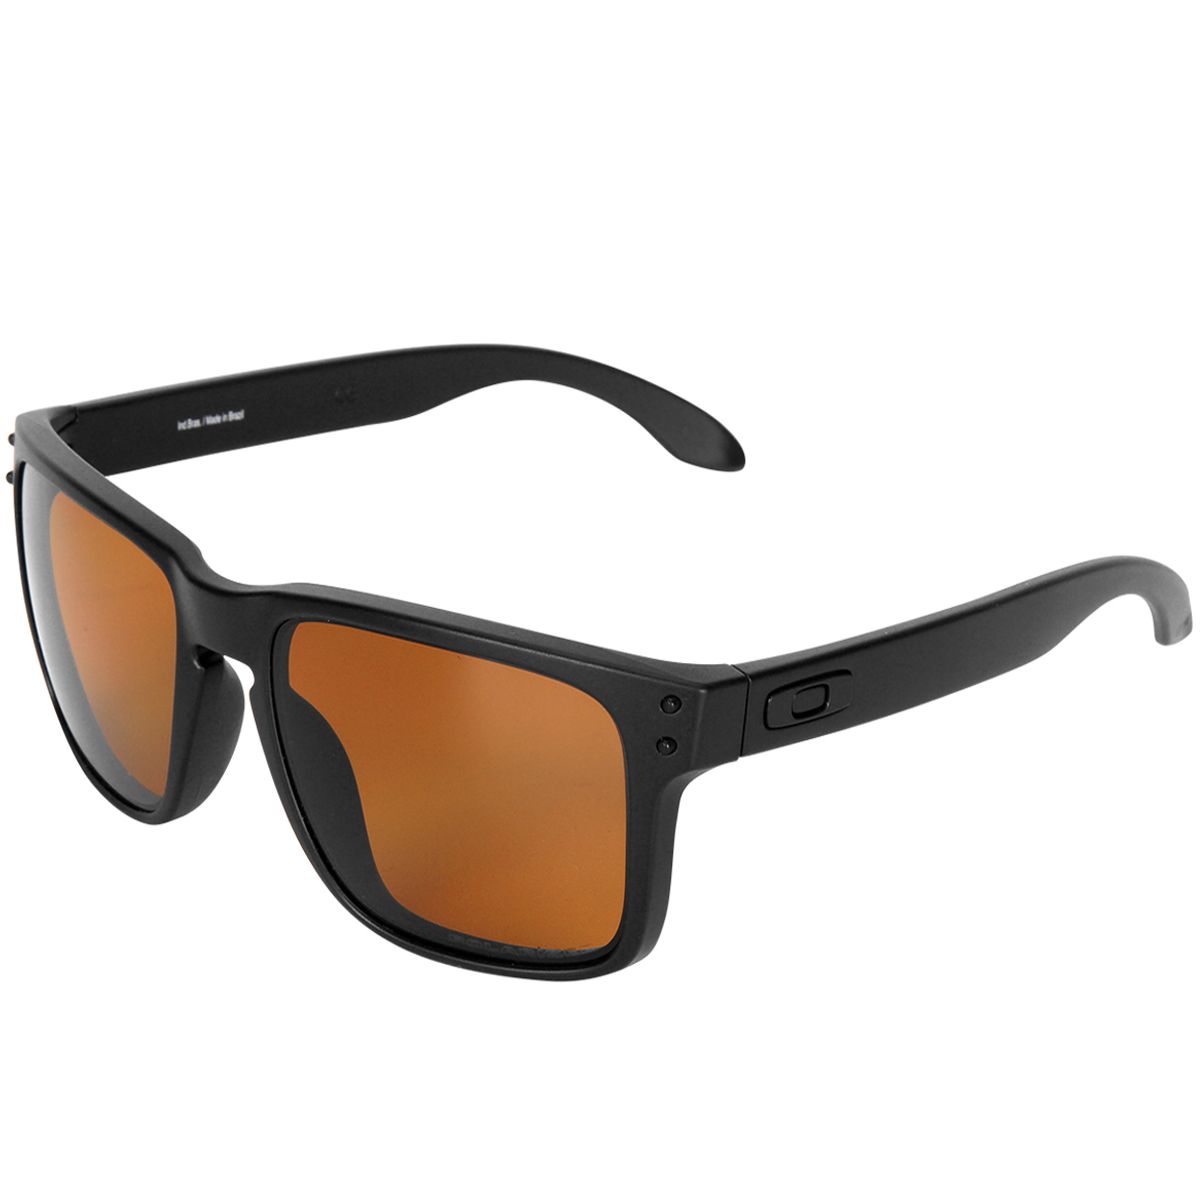 Óculos Oakley Holbrook LX Matte Black Lente Bronze Polarizado ref ... 6e60395eff